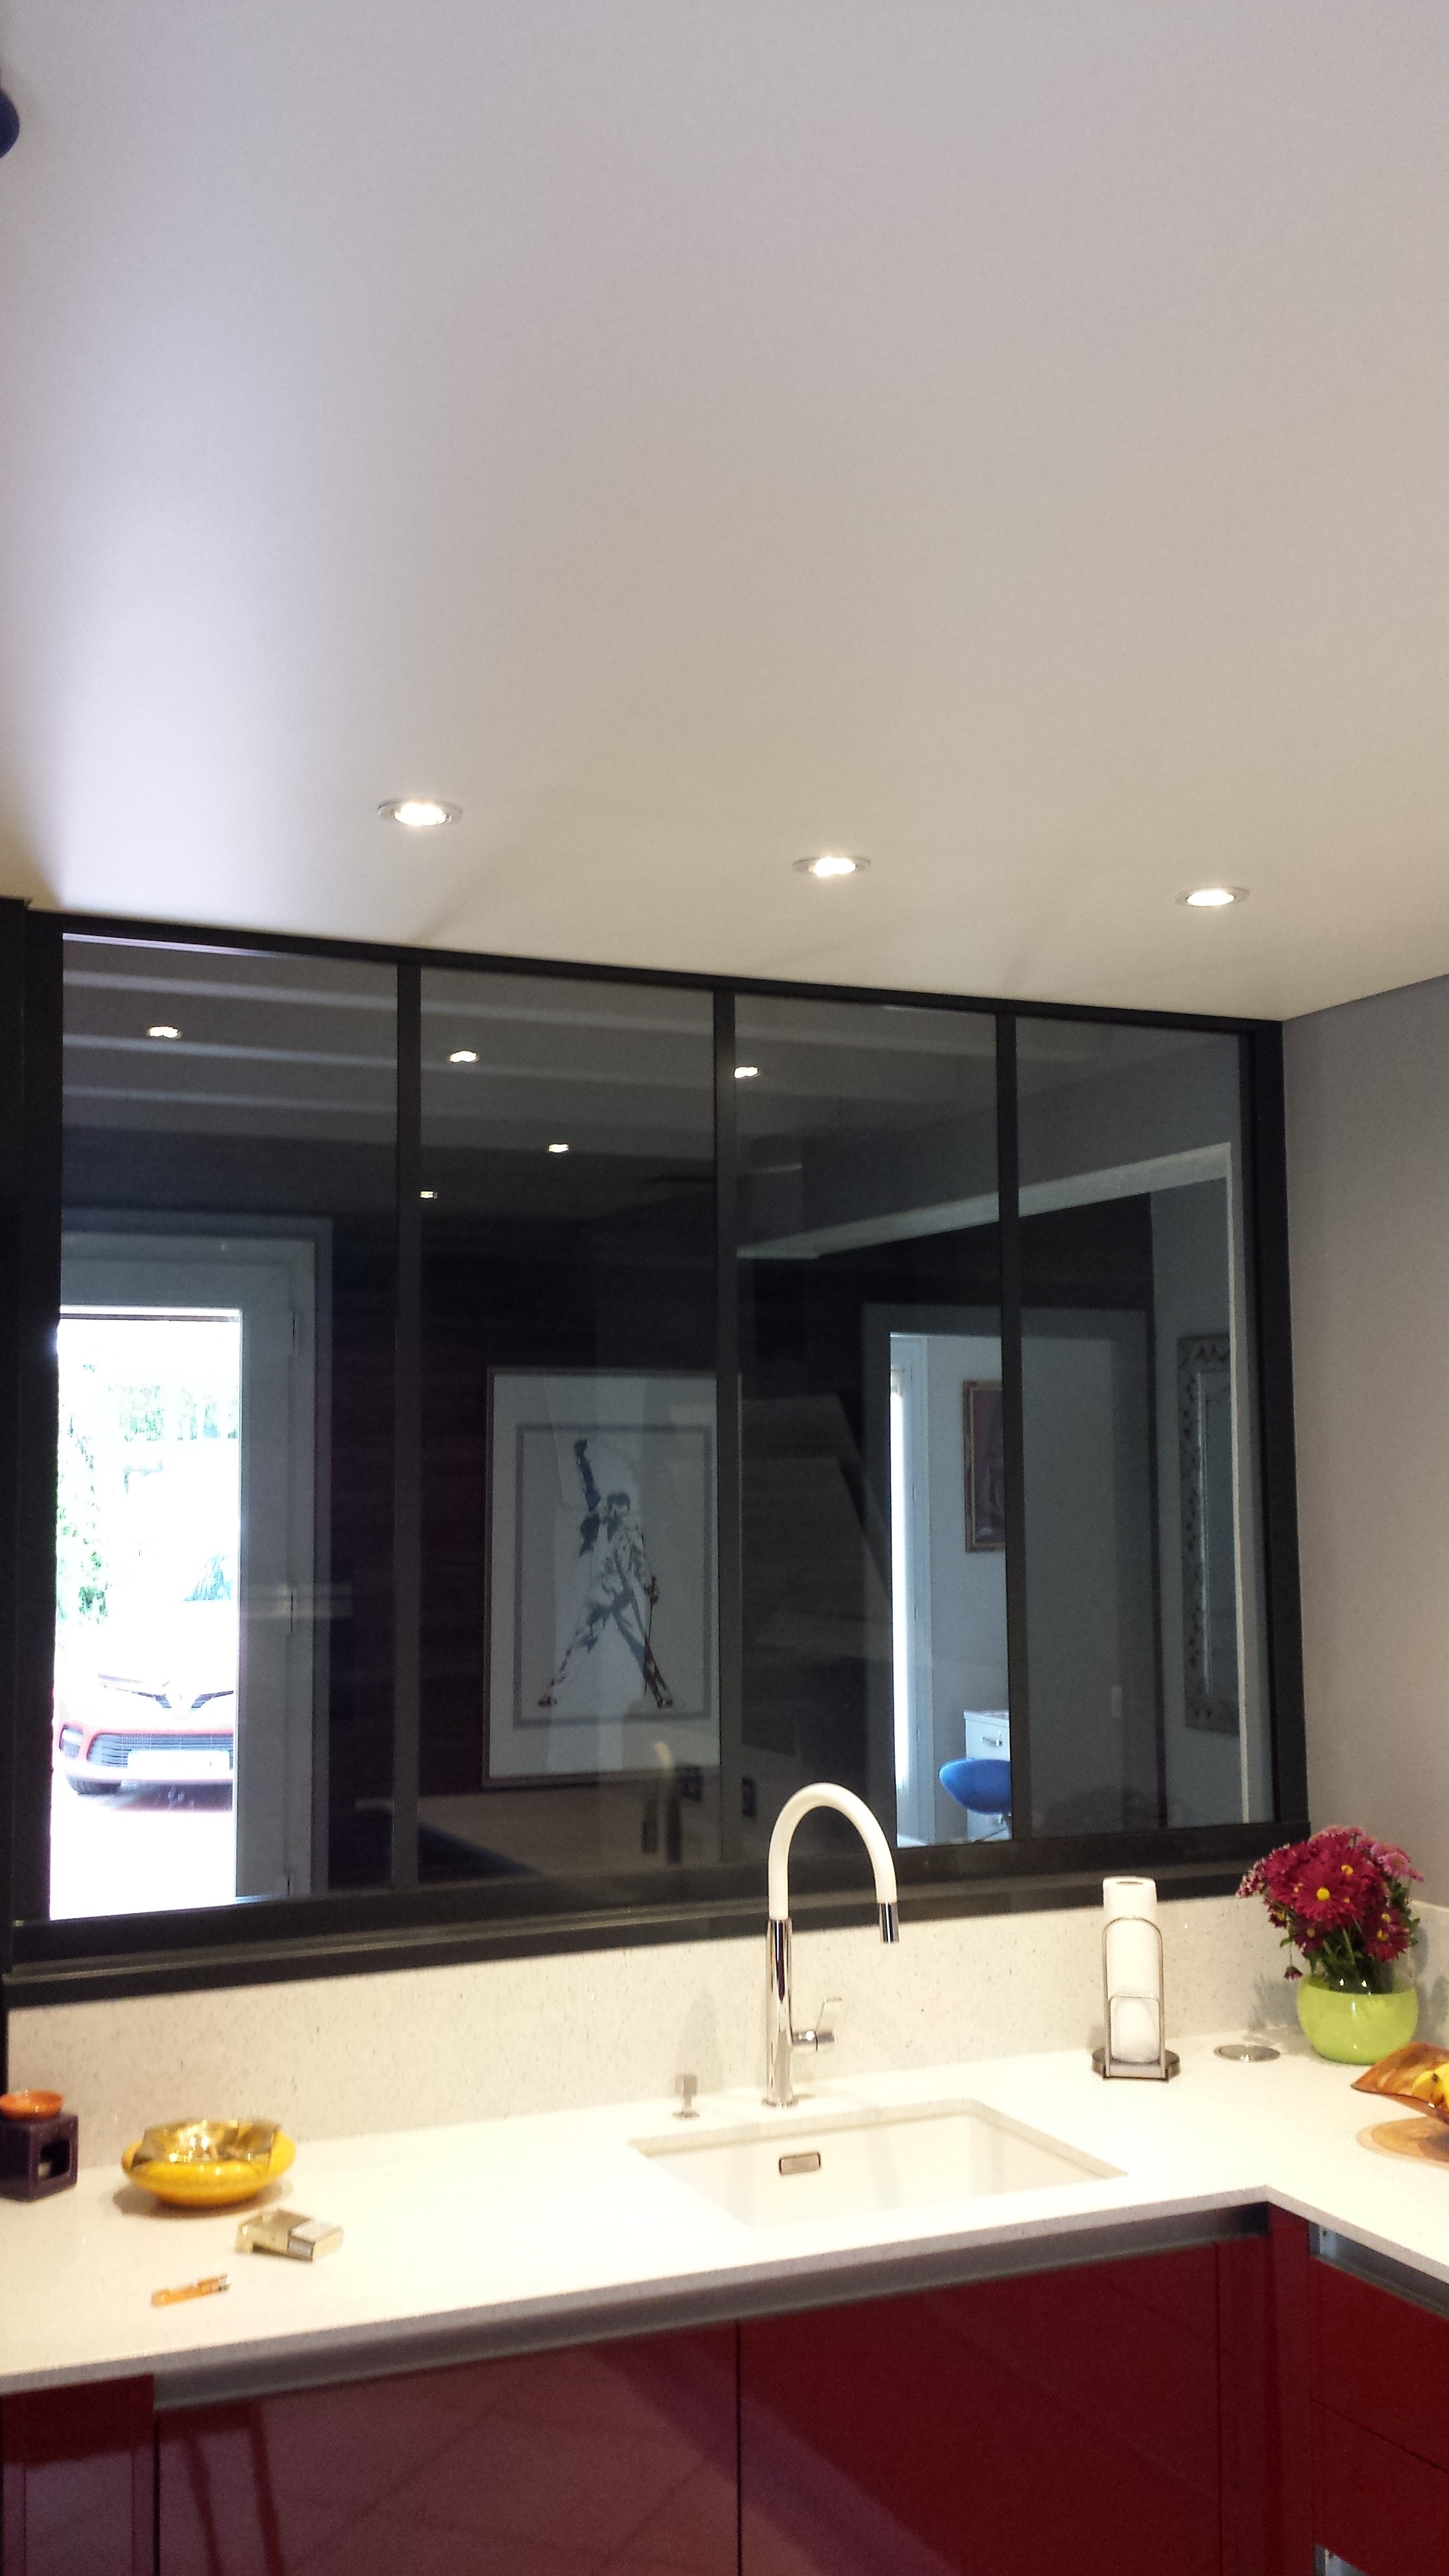 plafonds tendus meunier cuisines plafonds tendus meunier. Black Bedroom Furniture Sets. Home Design Ideas